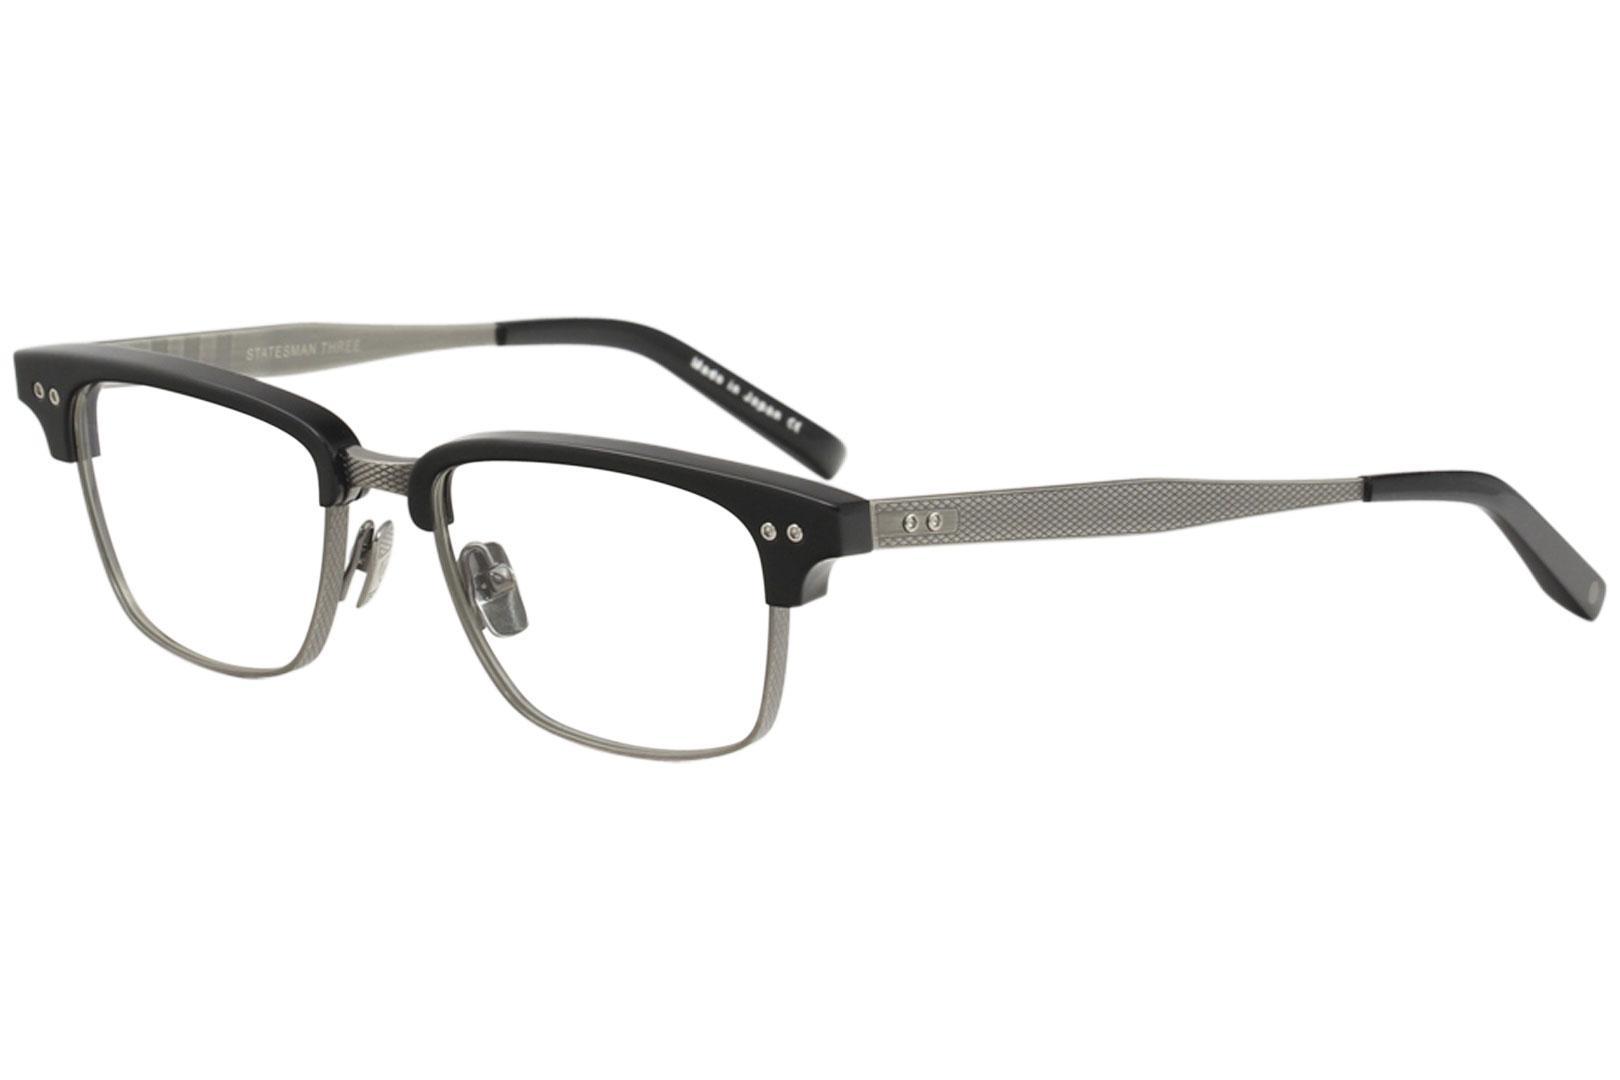 801770ddb3e Dita Men s Eyeglasses Statesman-Three DRX-2064 Full Rim Optical Frame